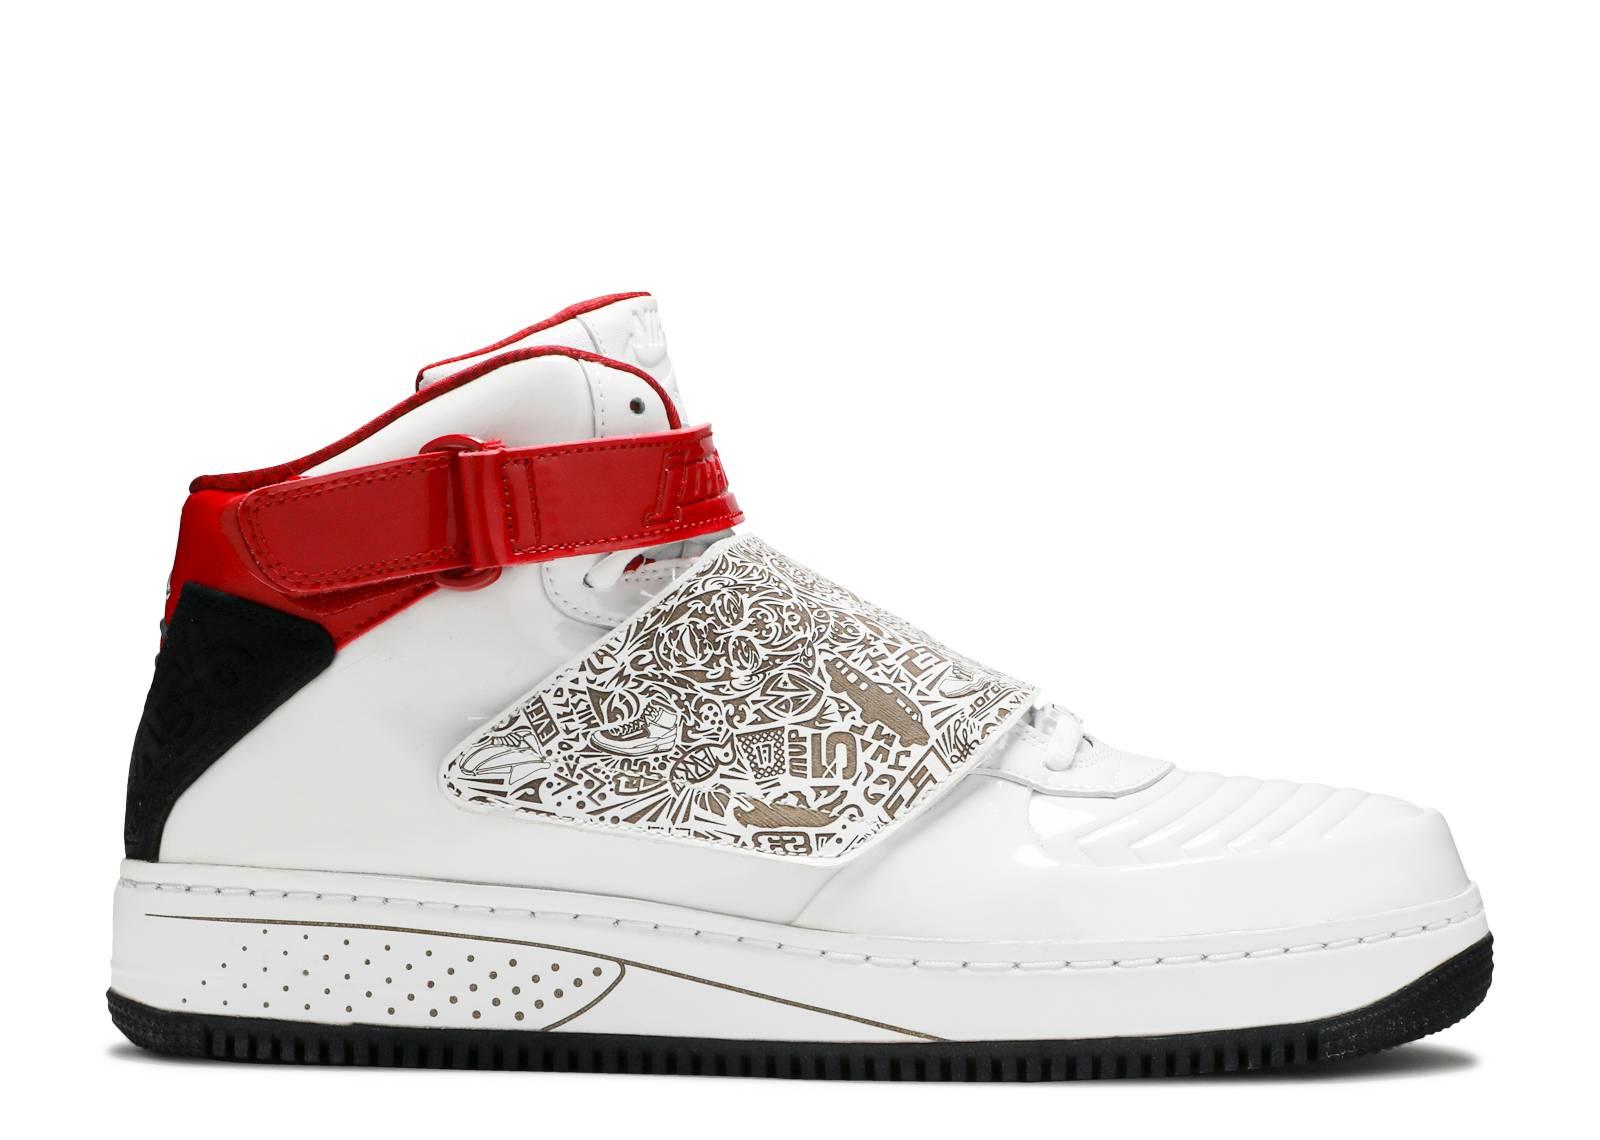 6fed80487261 Ajf 20 - Air Jordan - 331823 101 - white black-red